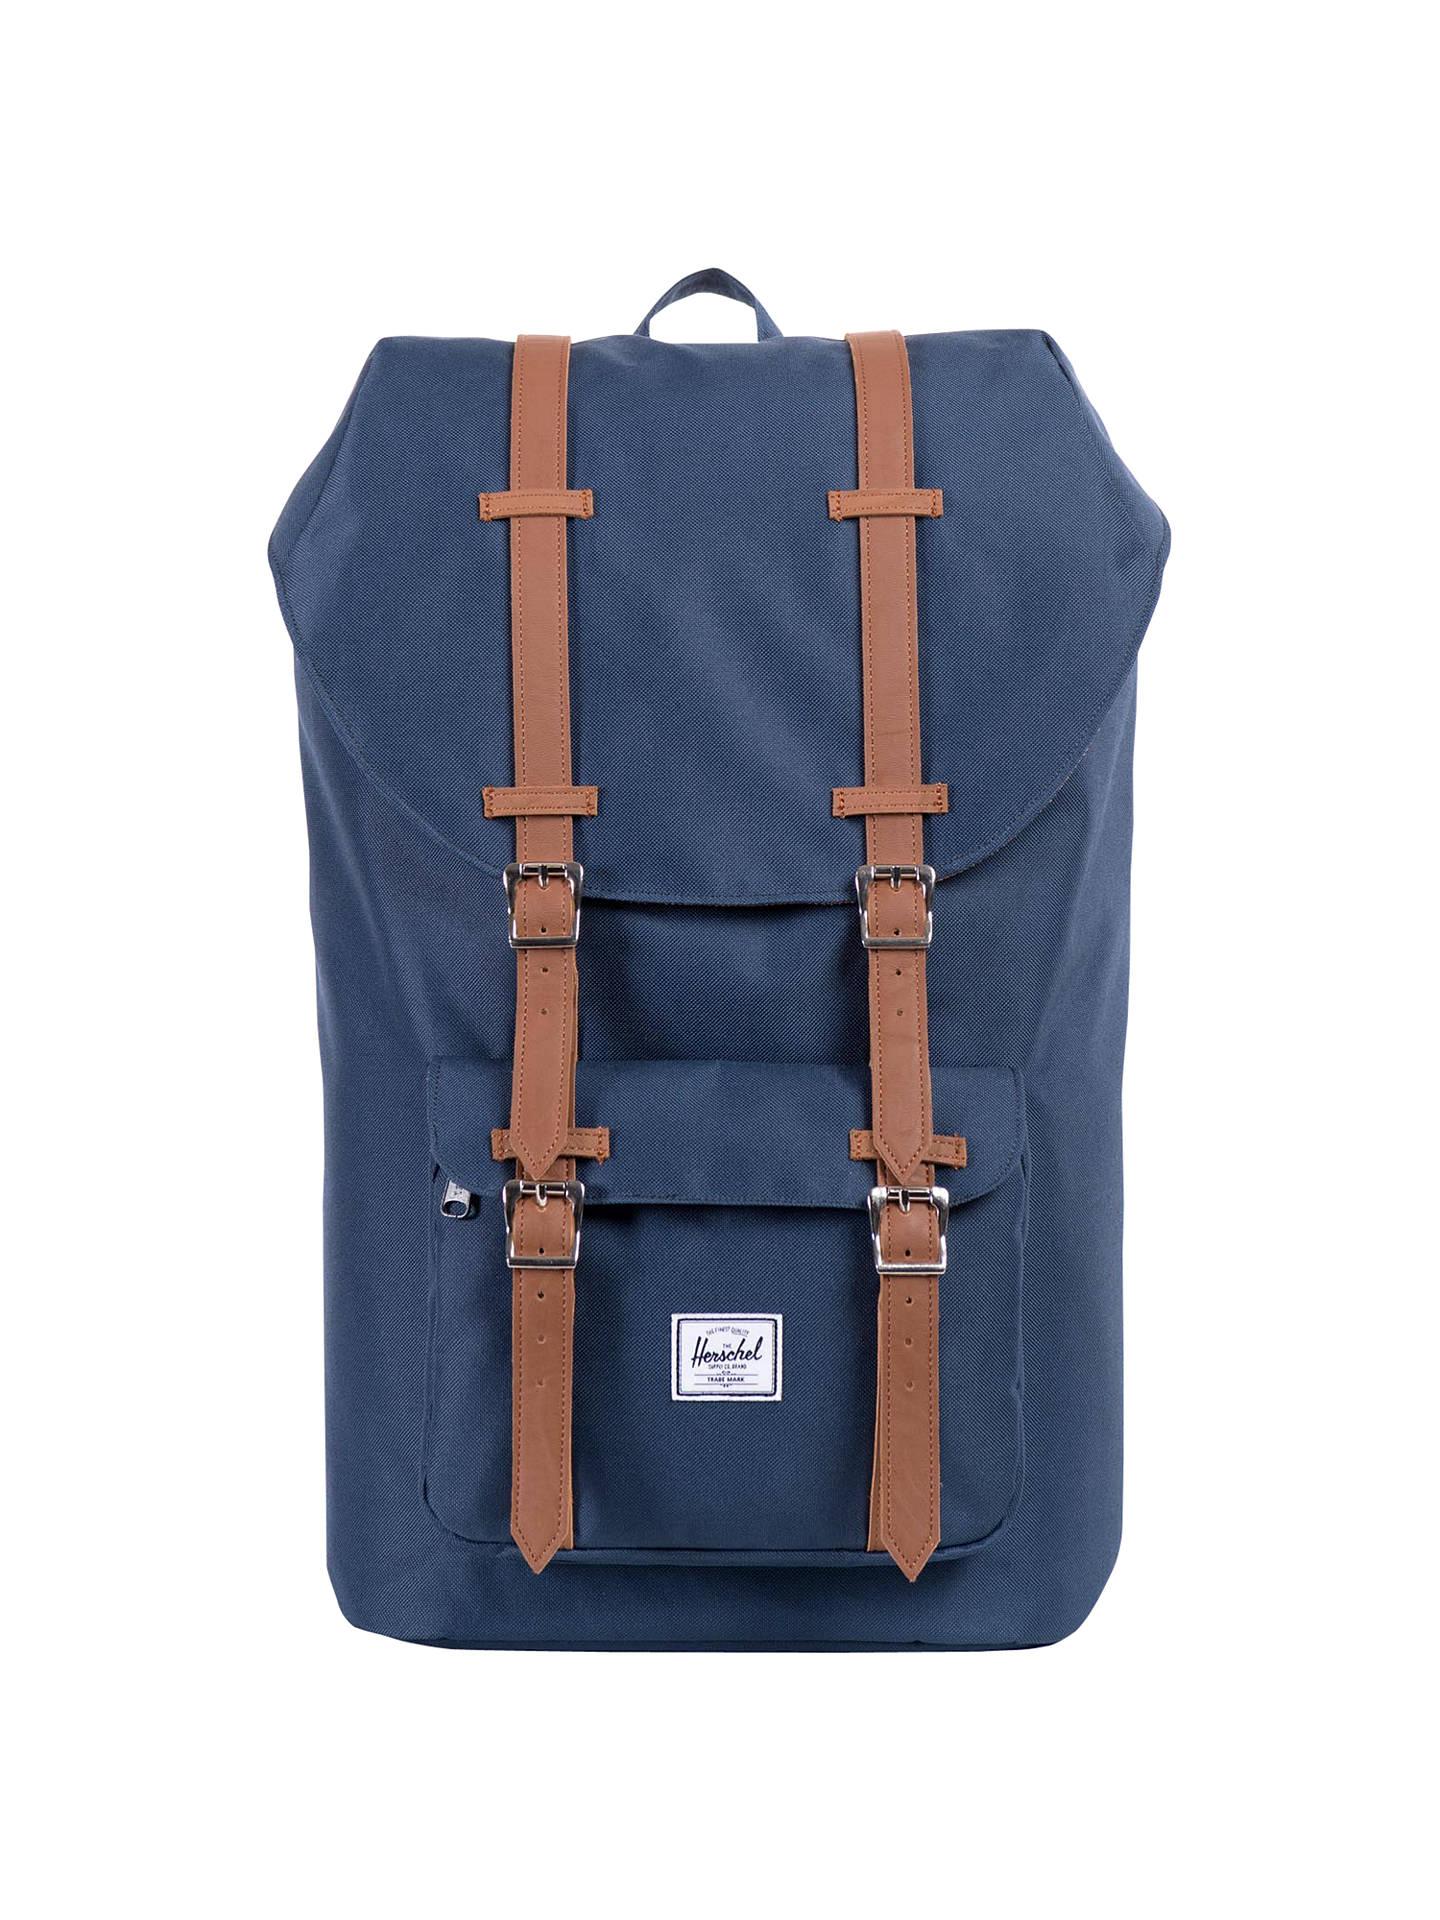 386952bfcd Buy Herschel Supply Co. Little America Backpack